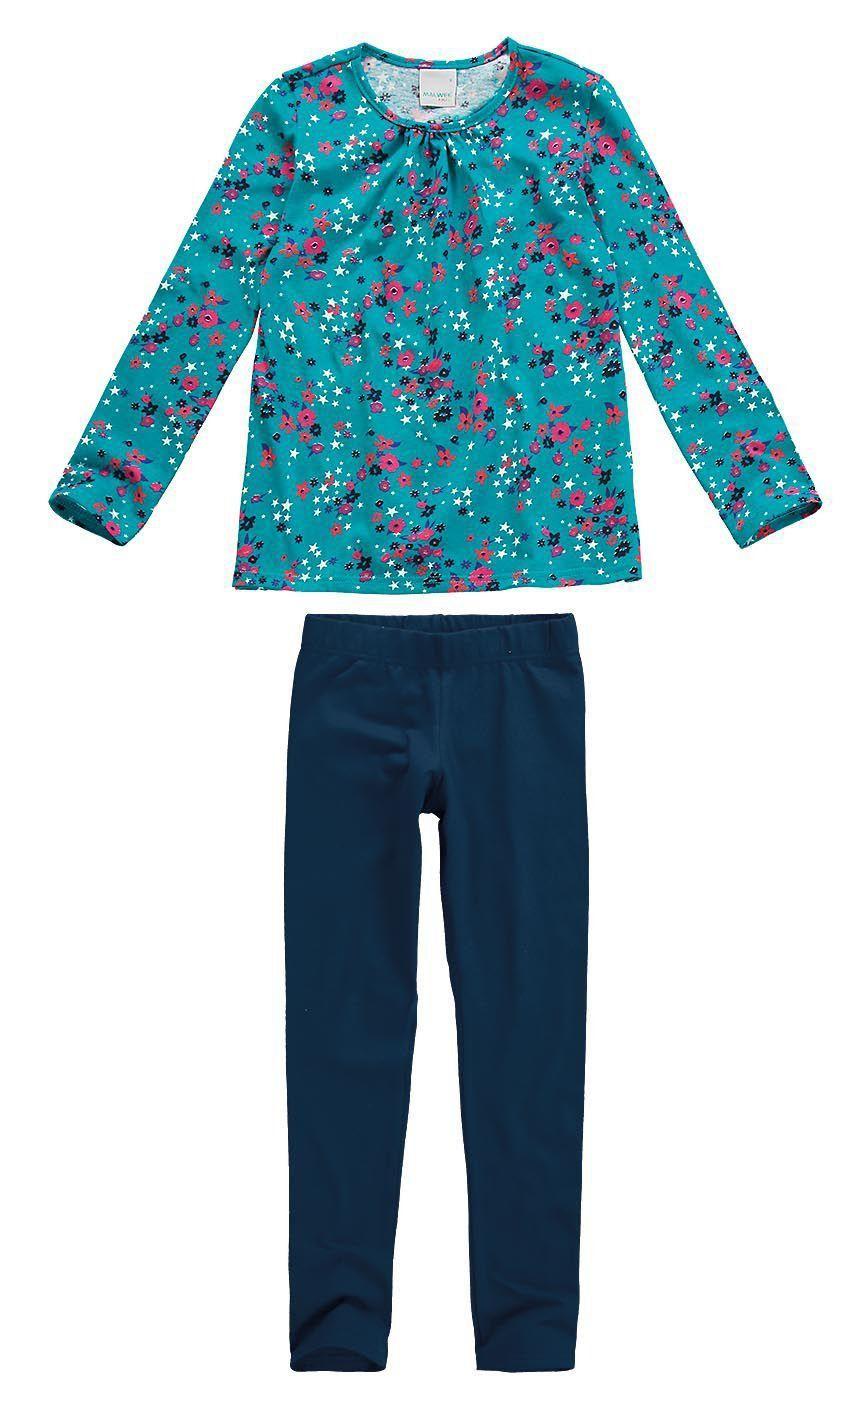 Conjunto Infantil Feminino Inverno Azul Floral Malwee